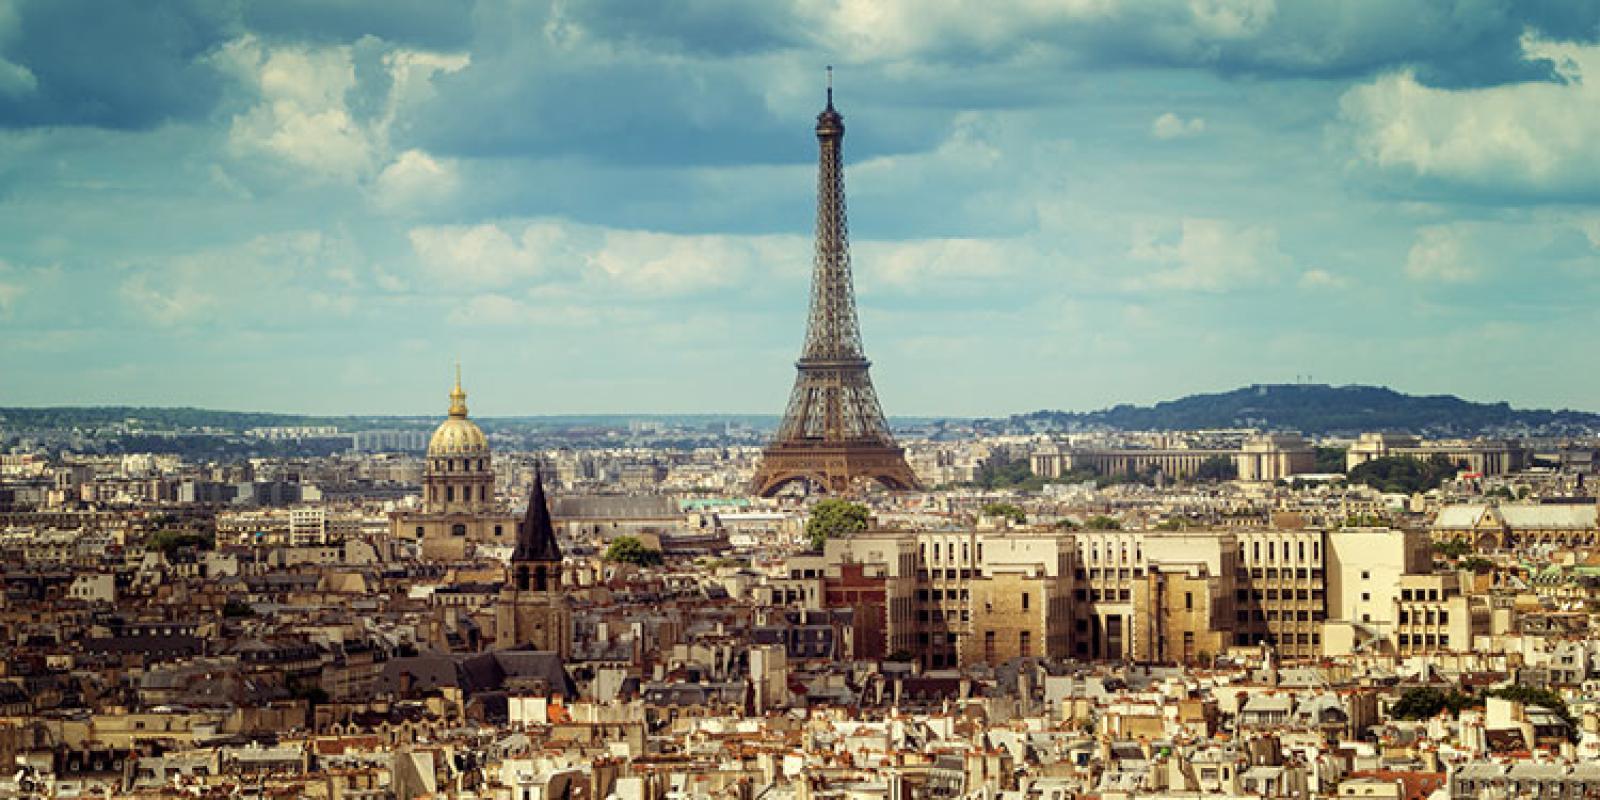 studentenreisen nach paris sightseeing kultur shopping mit isic. Black Bedroom Furniture Sets. Home Design Ideas